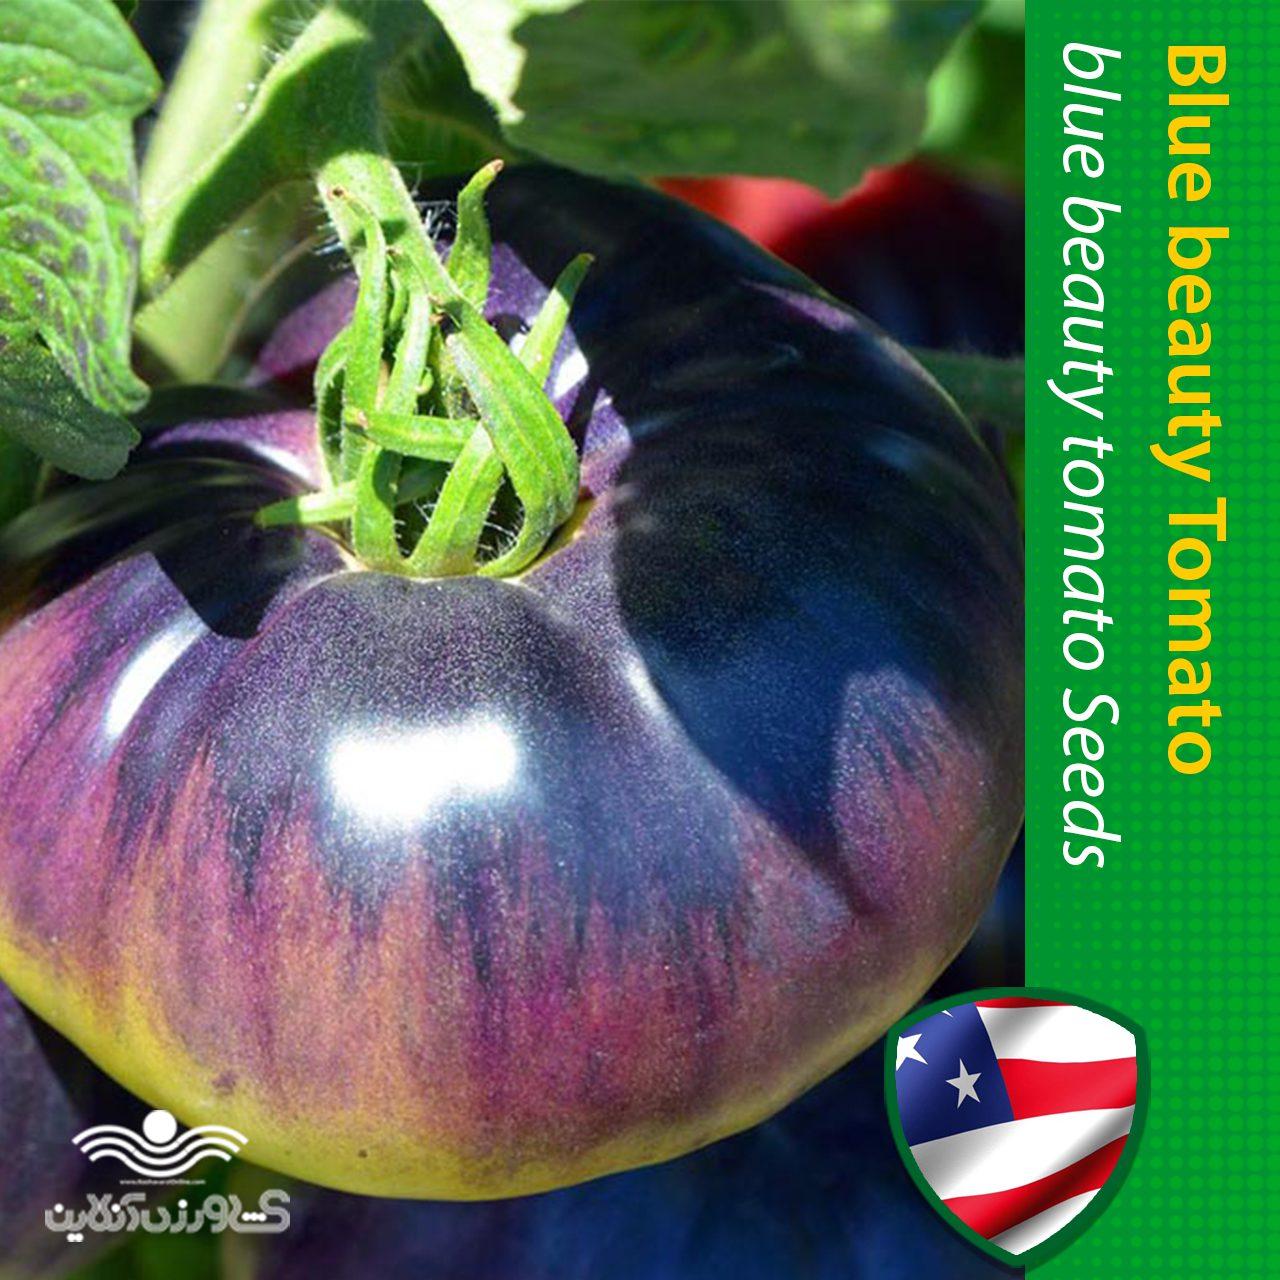 بذر گوجه فرنگی آبی زیبا